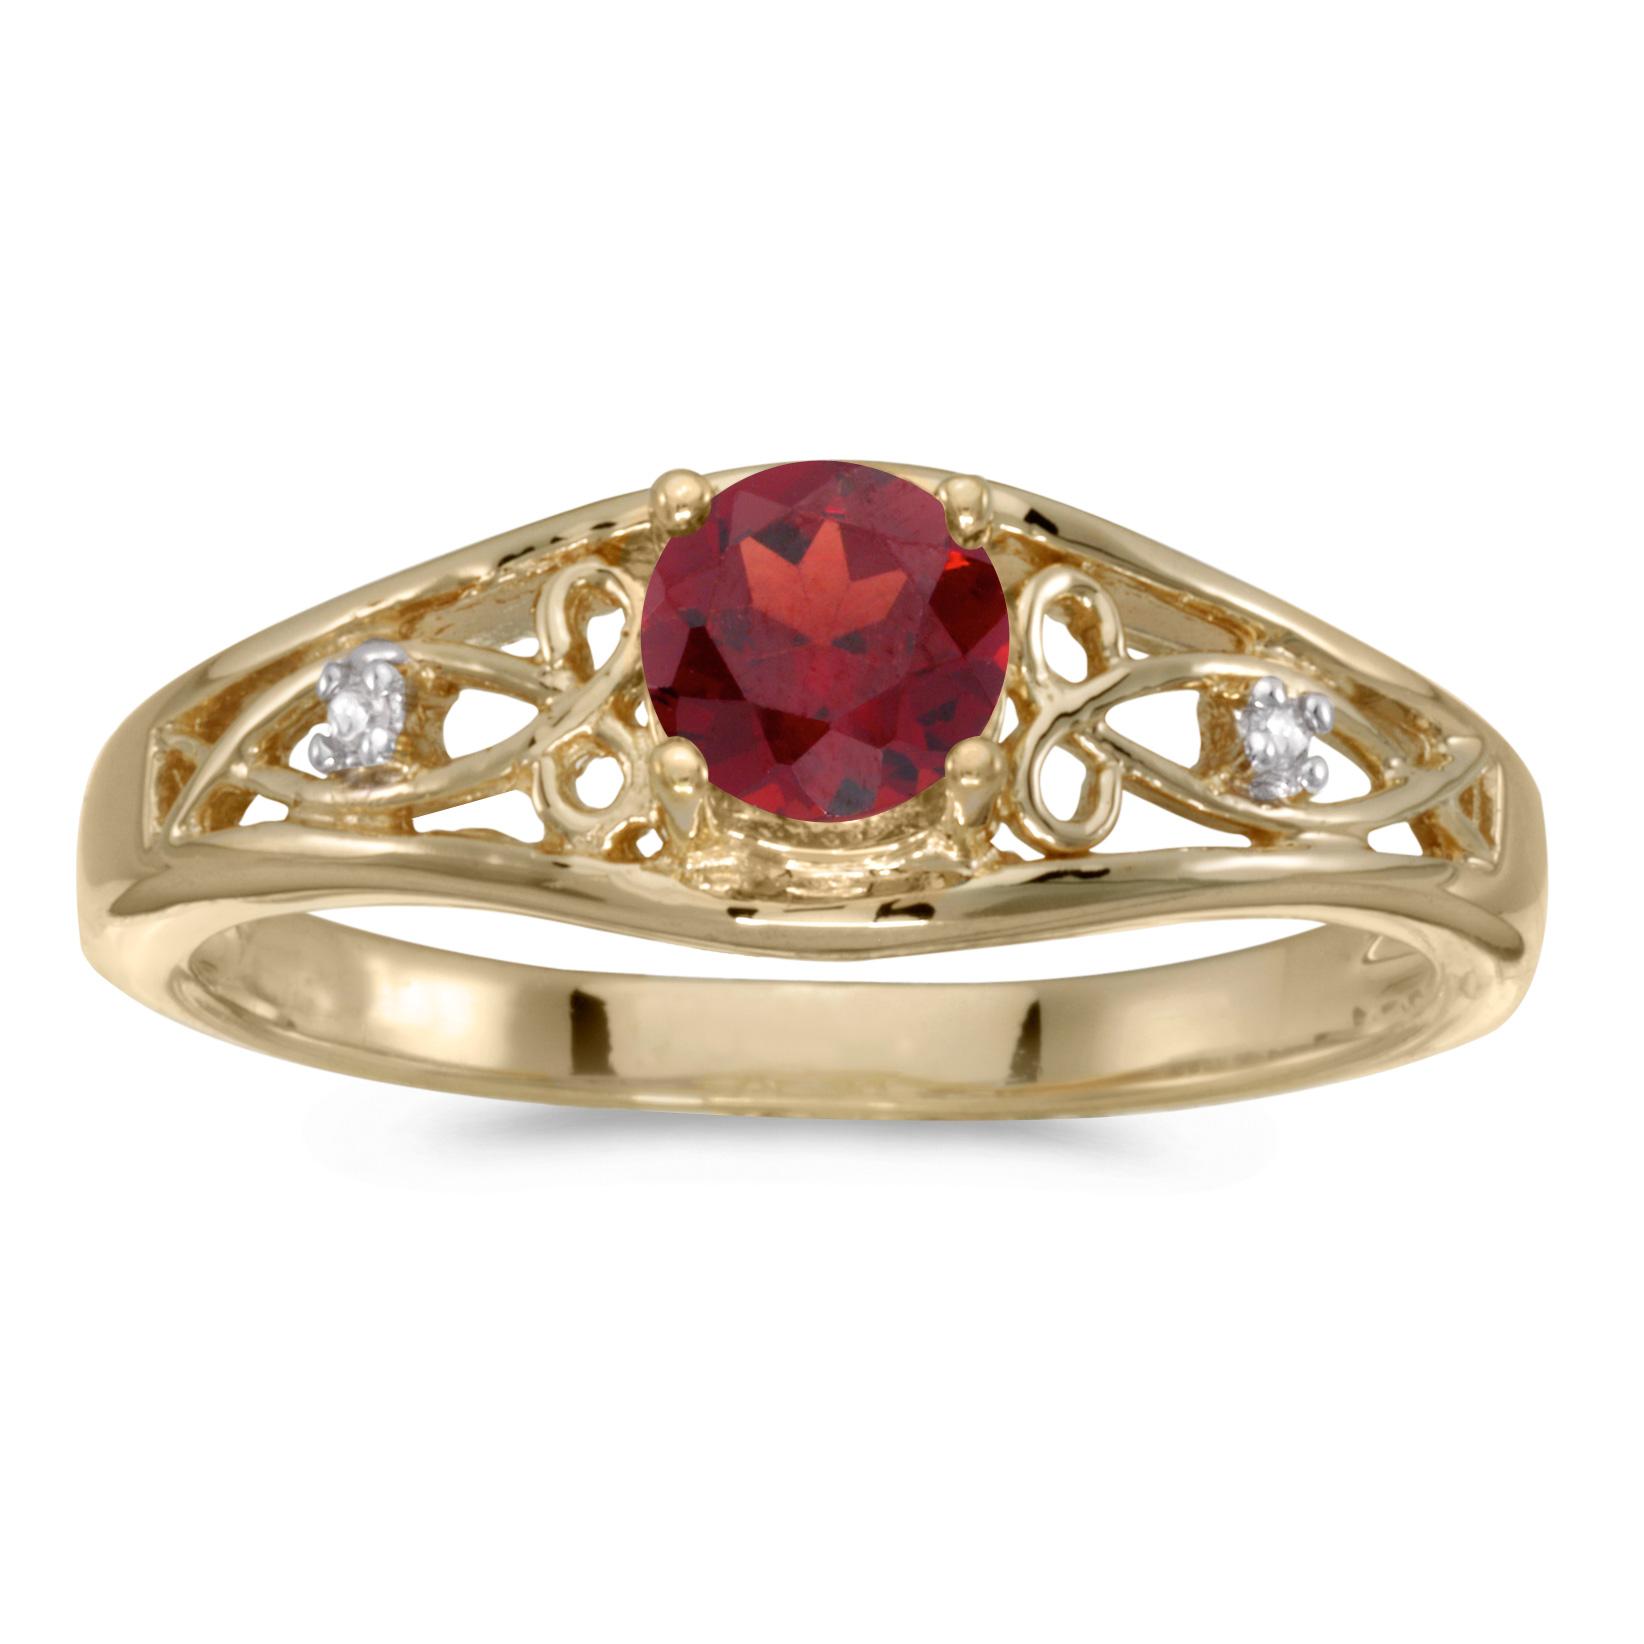 10k Yellow Gold Round Garnet And Diamond Ring by